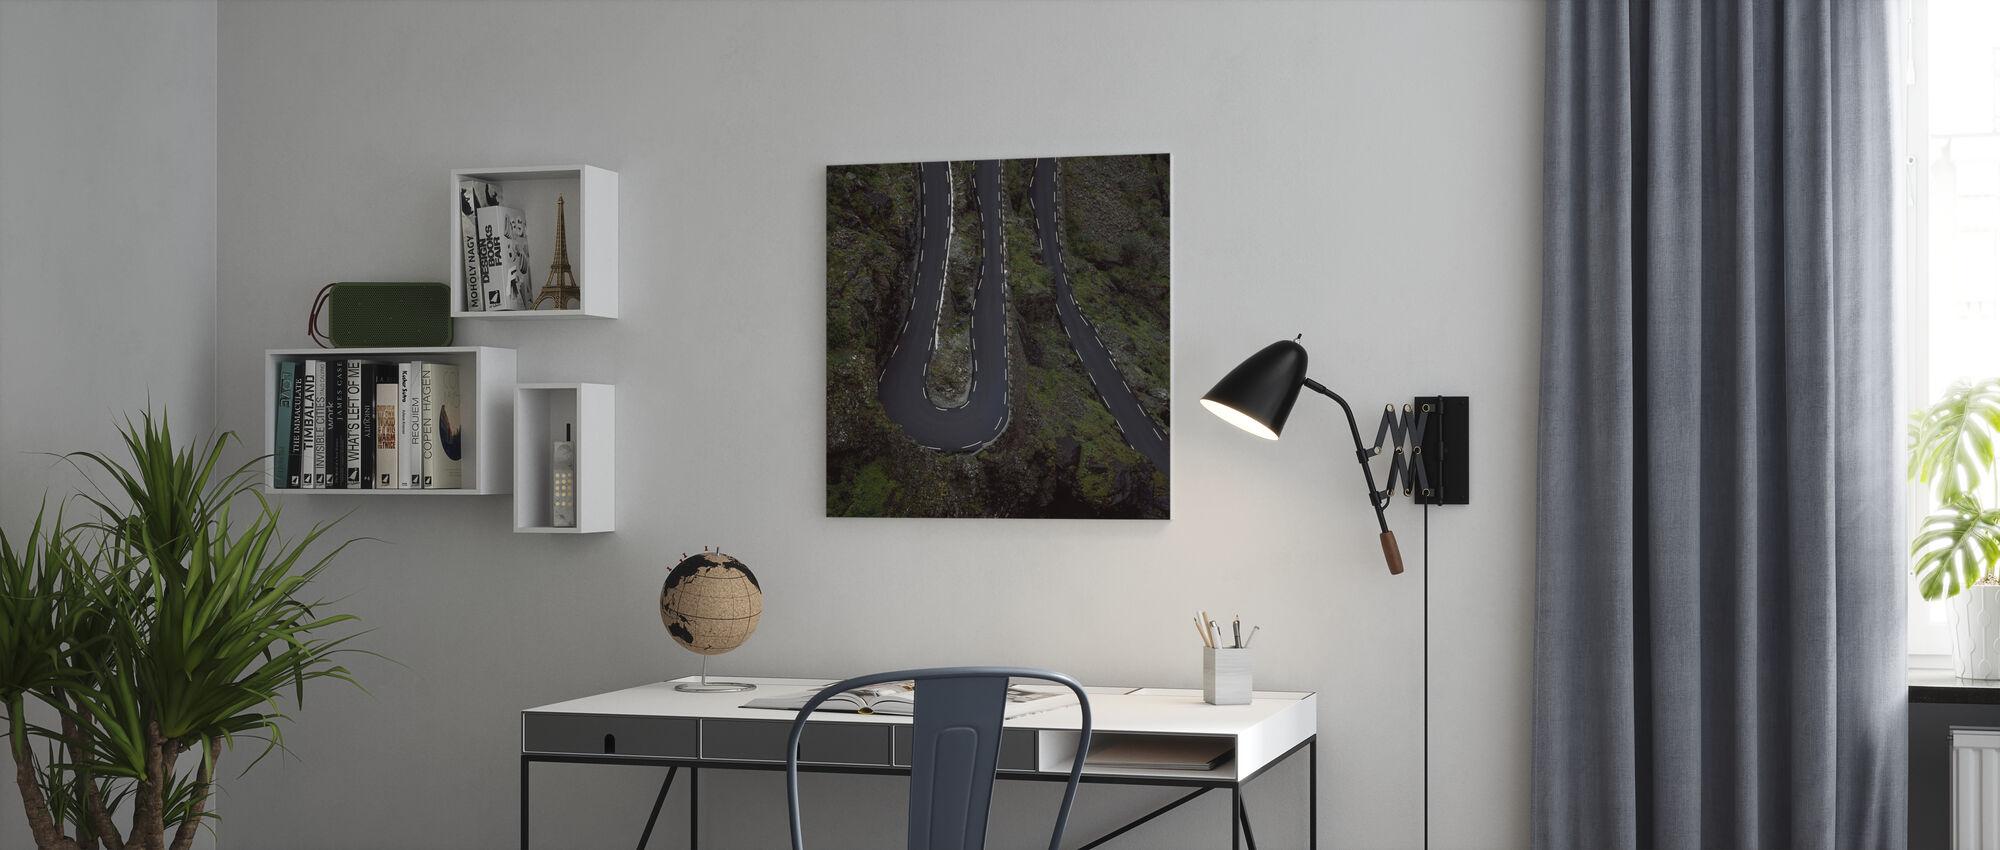 Trollstigen Curves in Rauma, Norway - Canvas print - Office